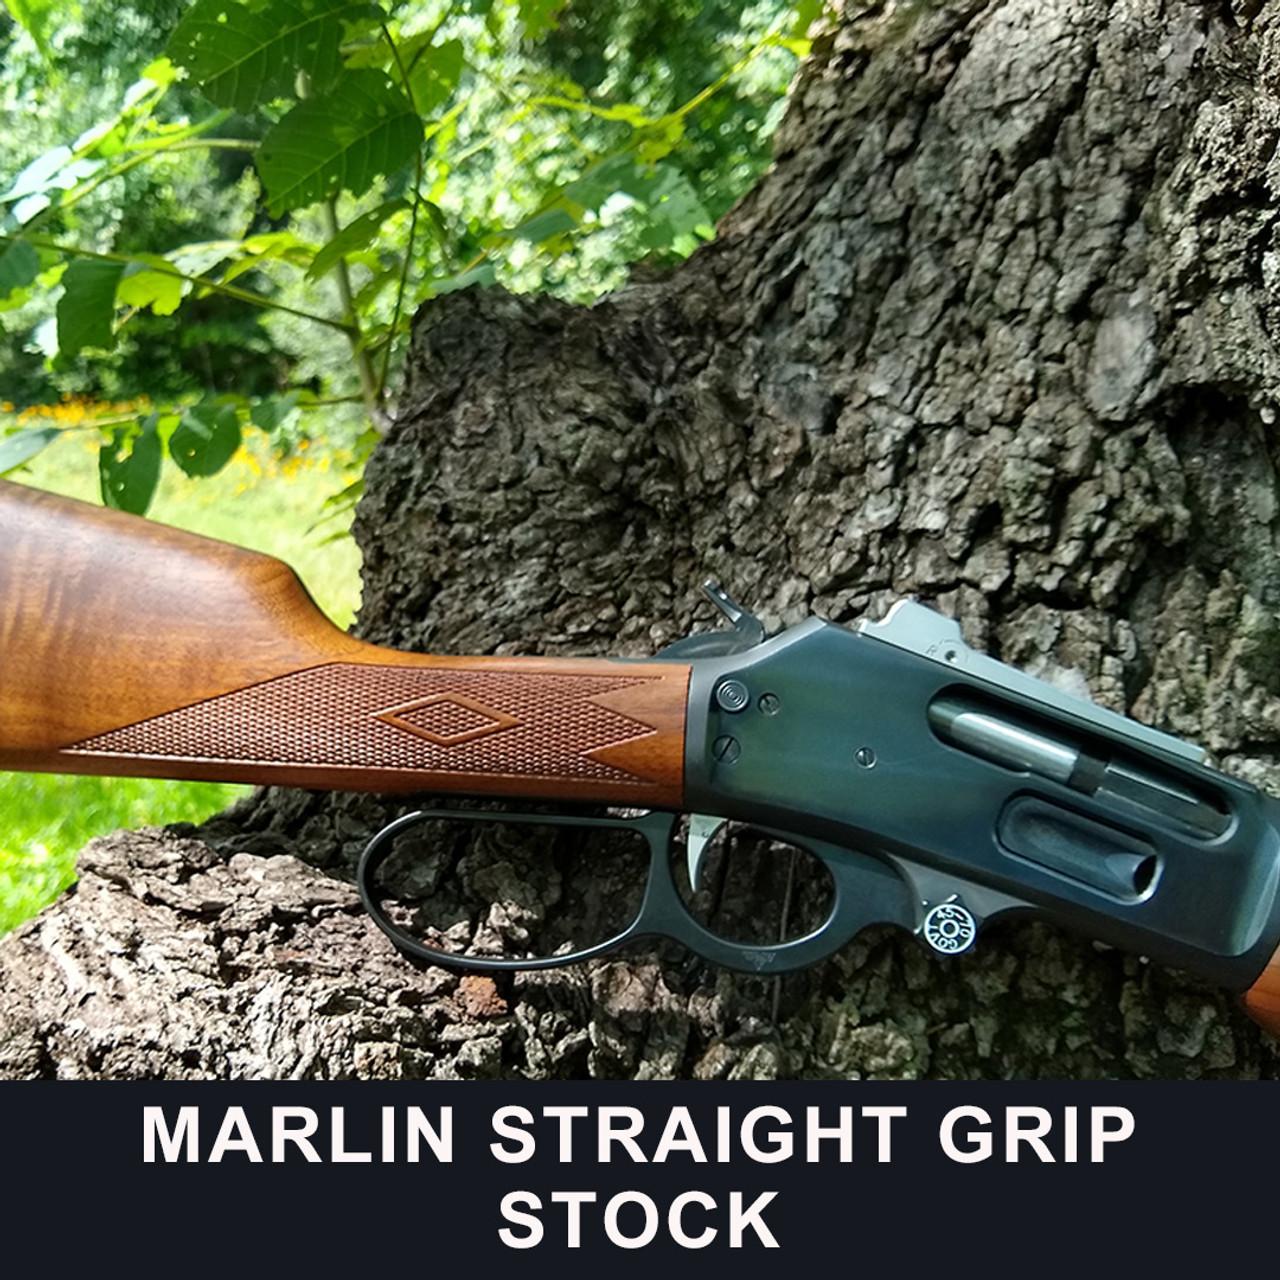 Marlin Straight Grip lever 336 30-30, 308/338, 410, 444, 1895 45-70, 450M